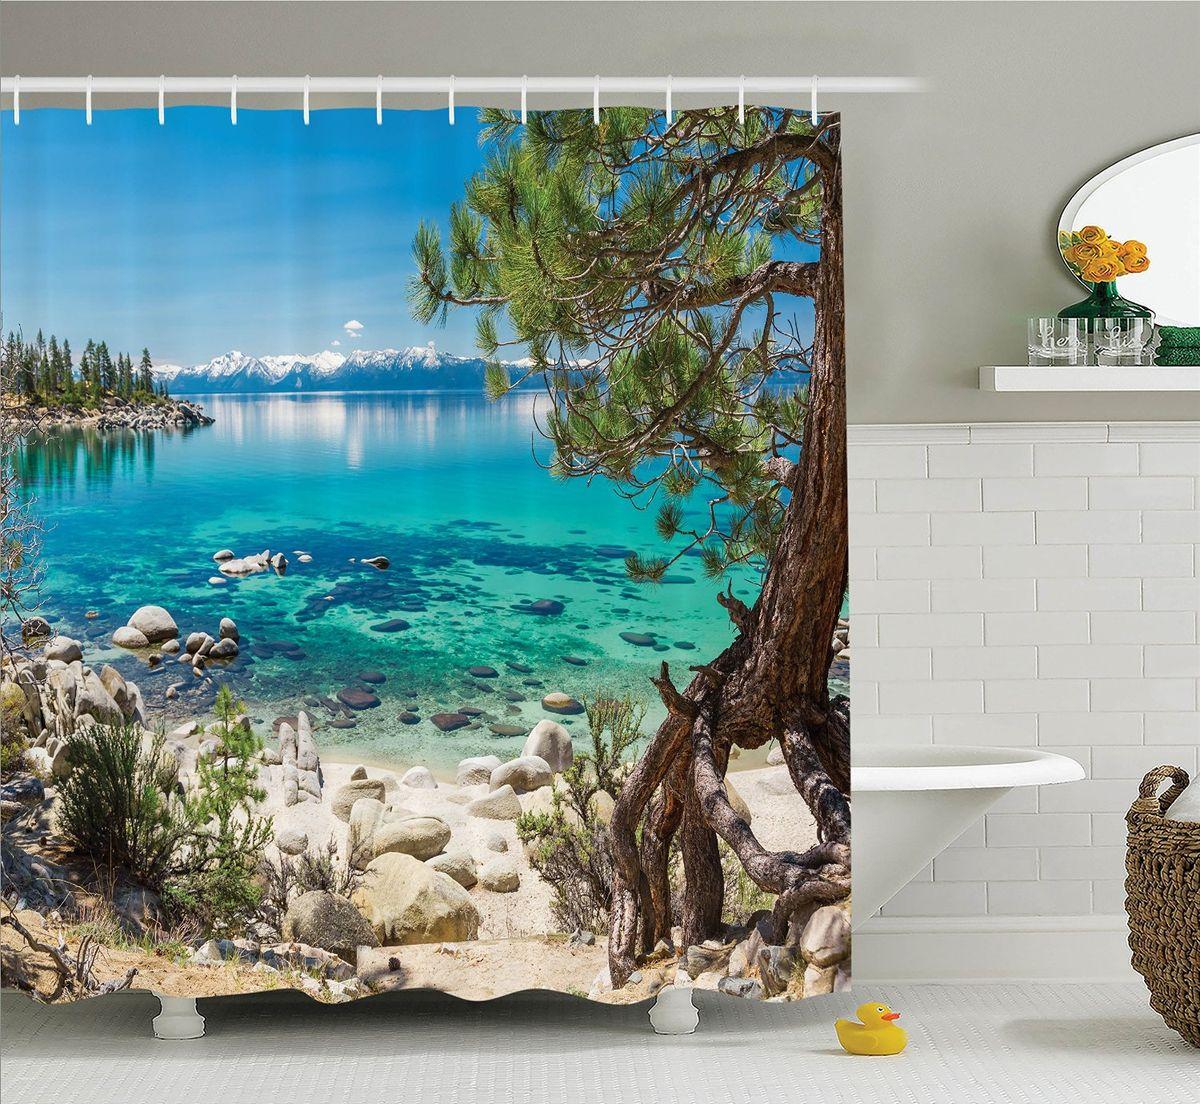 Штора для ванной комнаты Magic Lady Сосна на морском берегу, 180 х 200 см штора для ванной комнаты magic lady кроны над морем 180 х 200 см